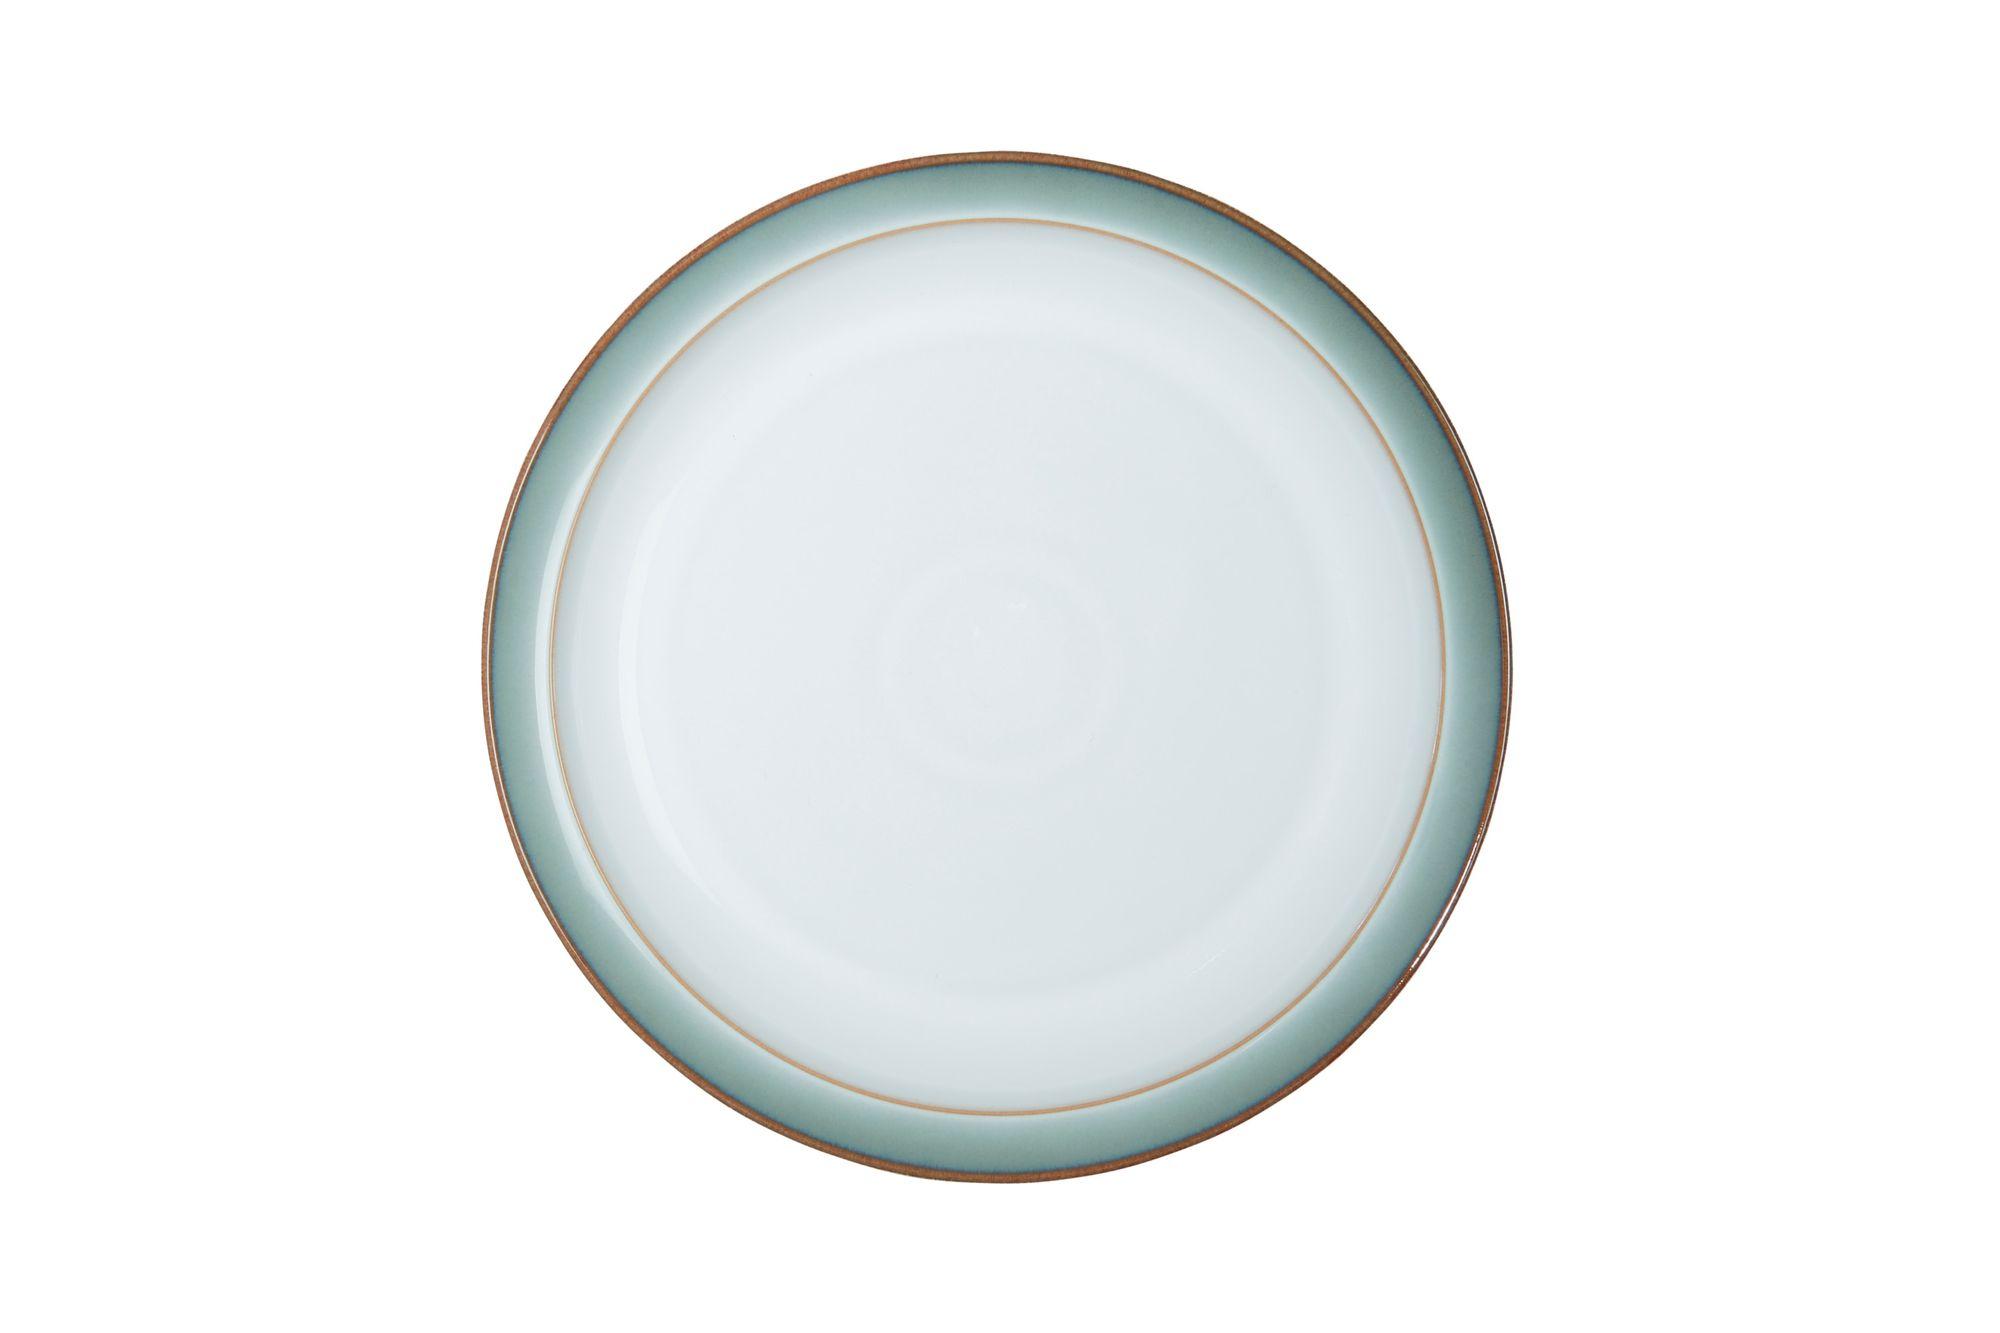 Denby Regency Green Tea Plate Deep Plate 18.5 x 3cm thumb 2